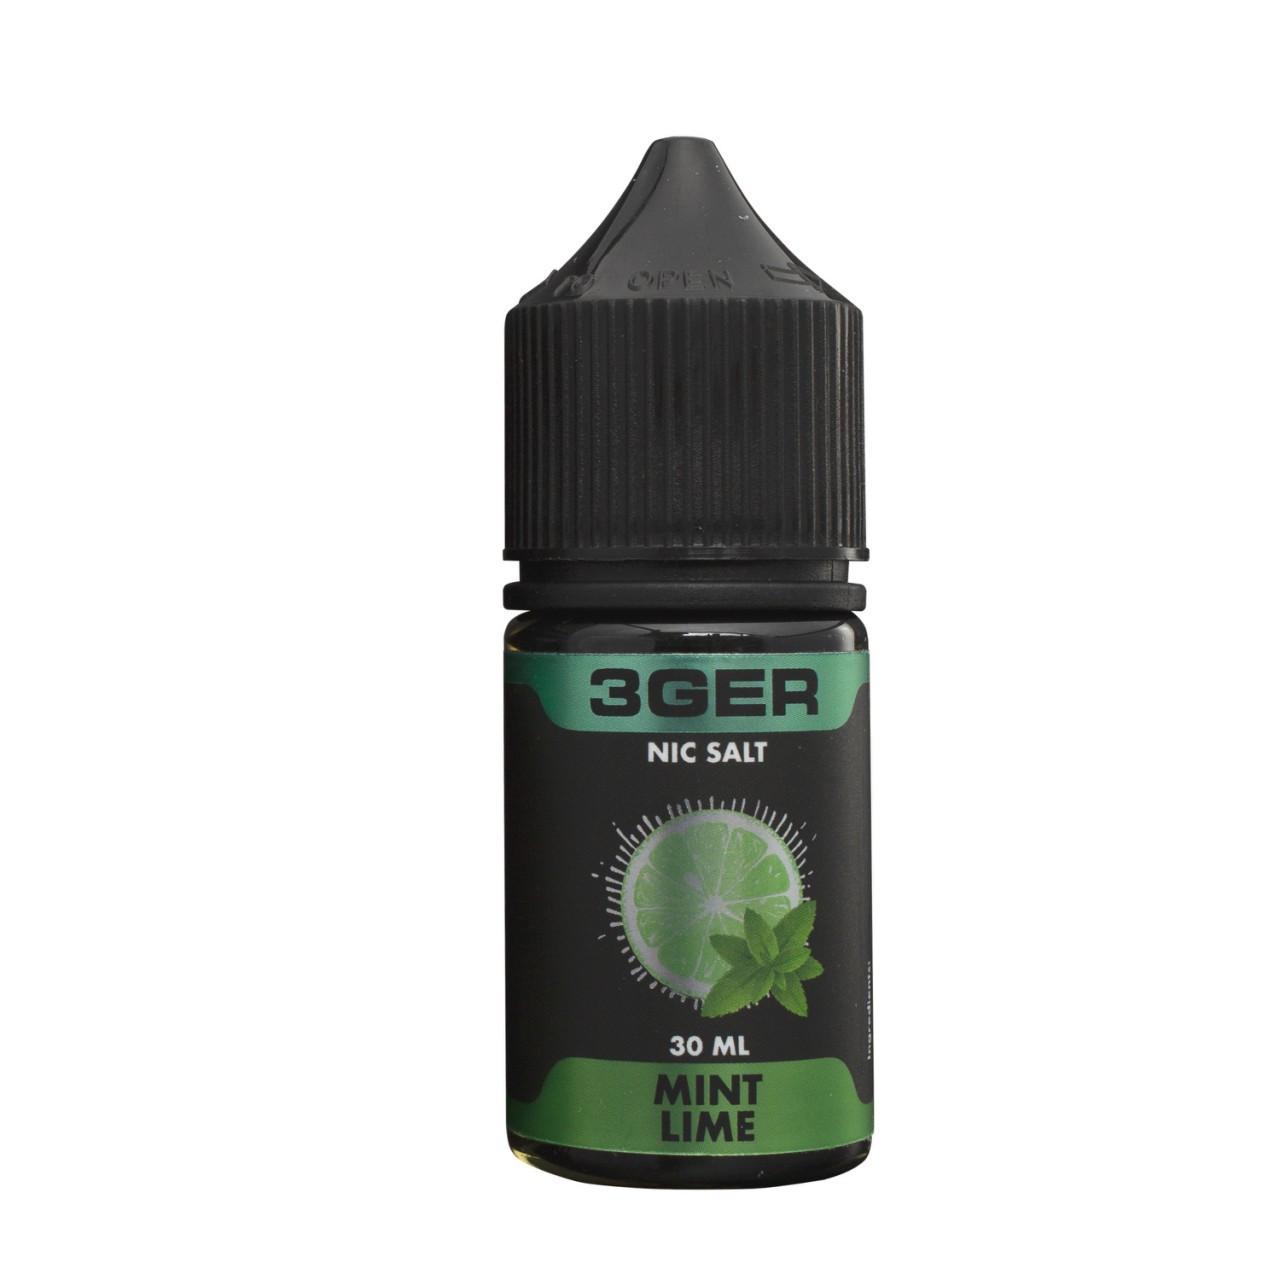 Жидкость 3Ger Salt Mint Lime 25 мг 30 мл